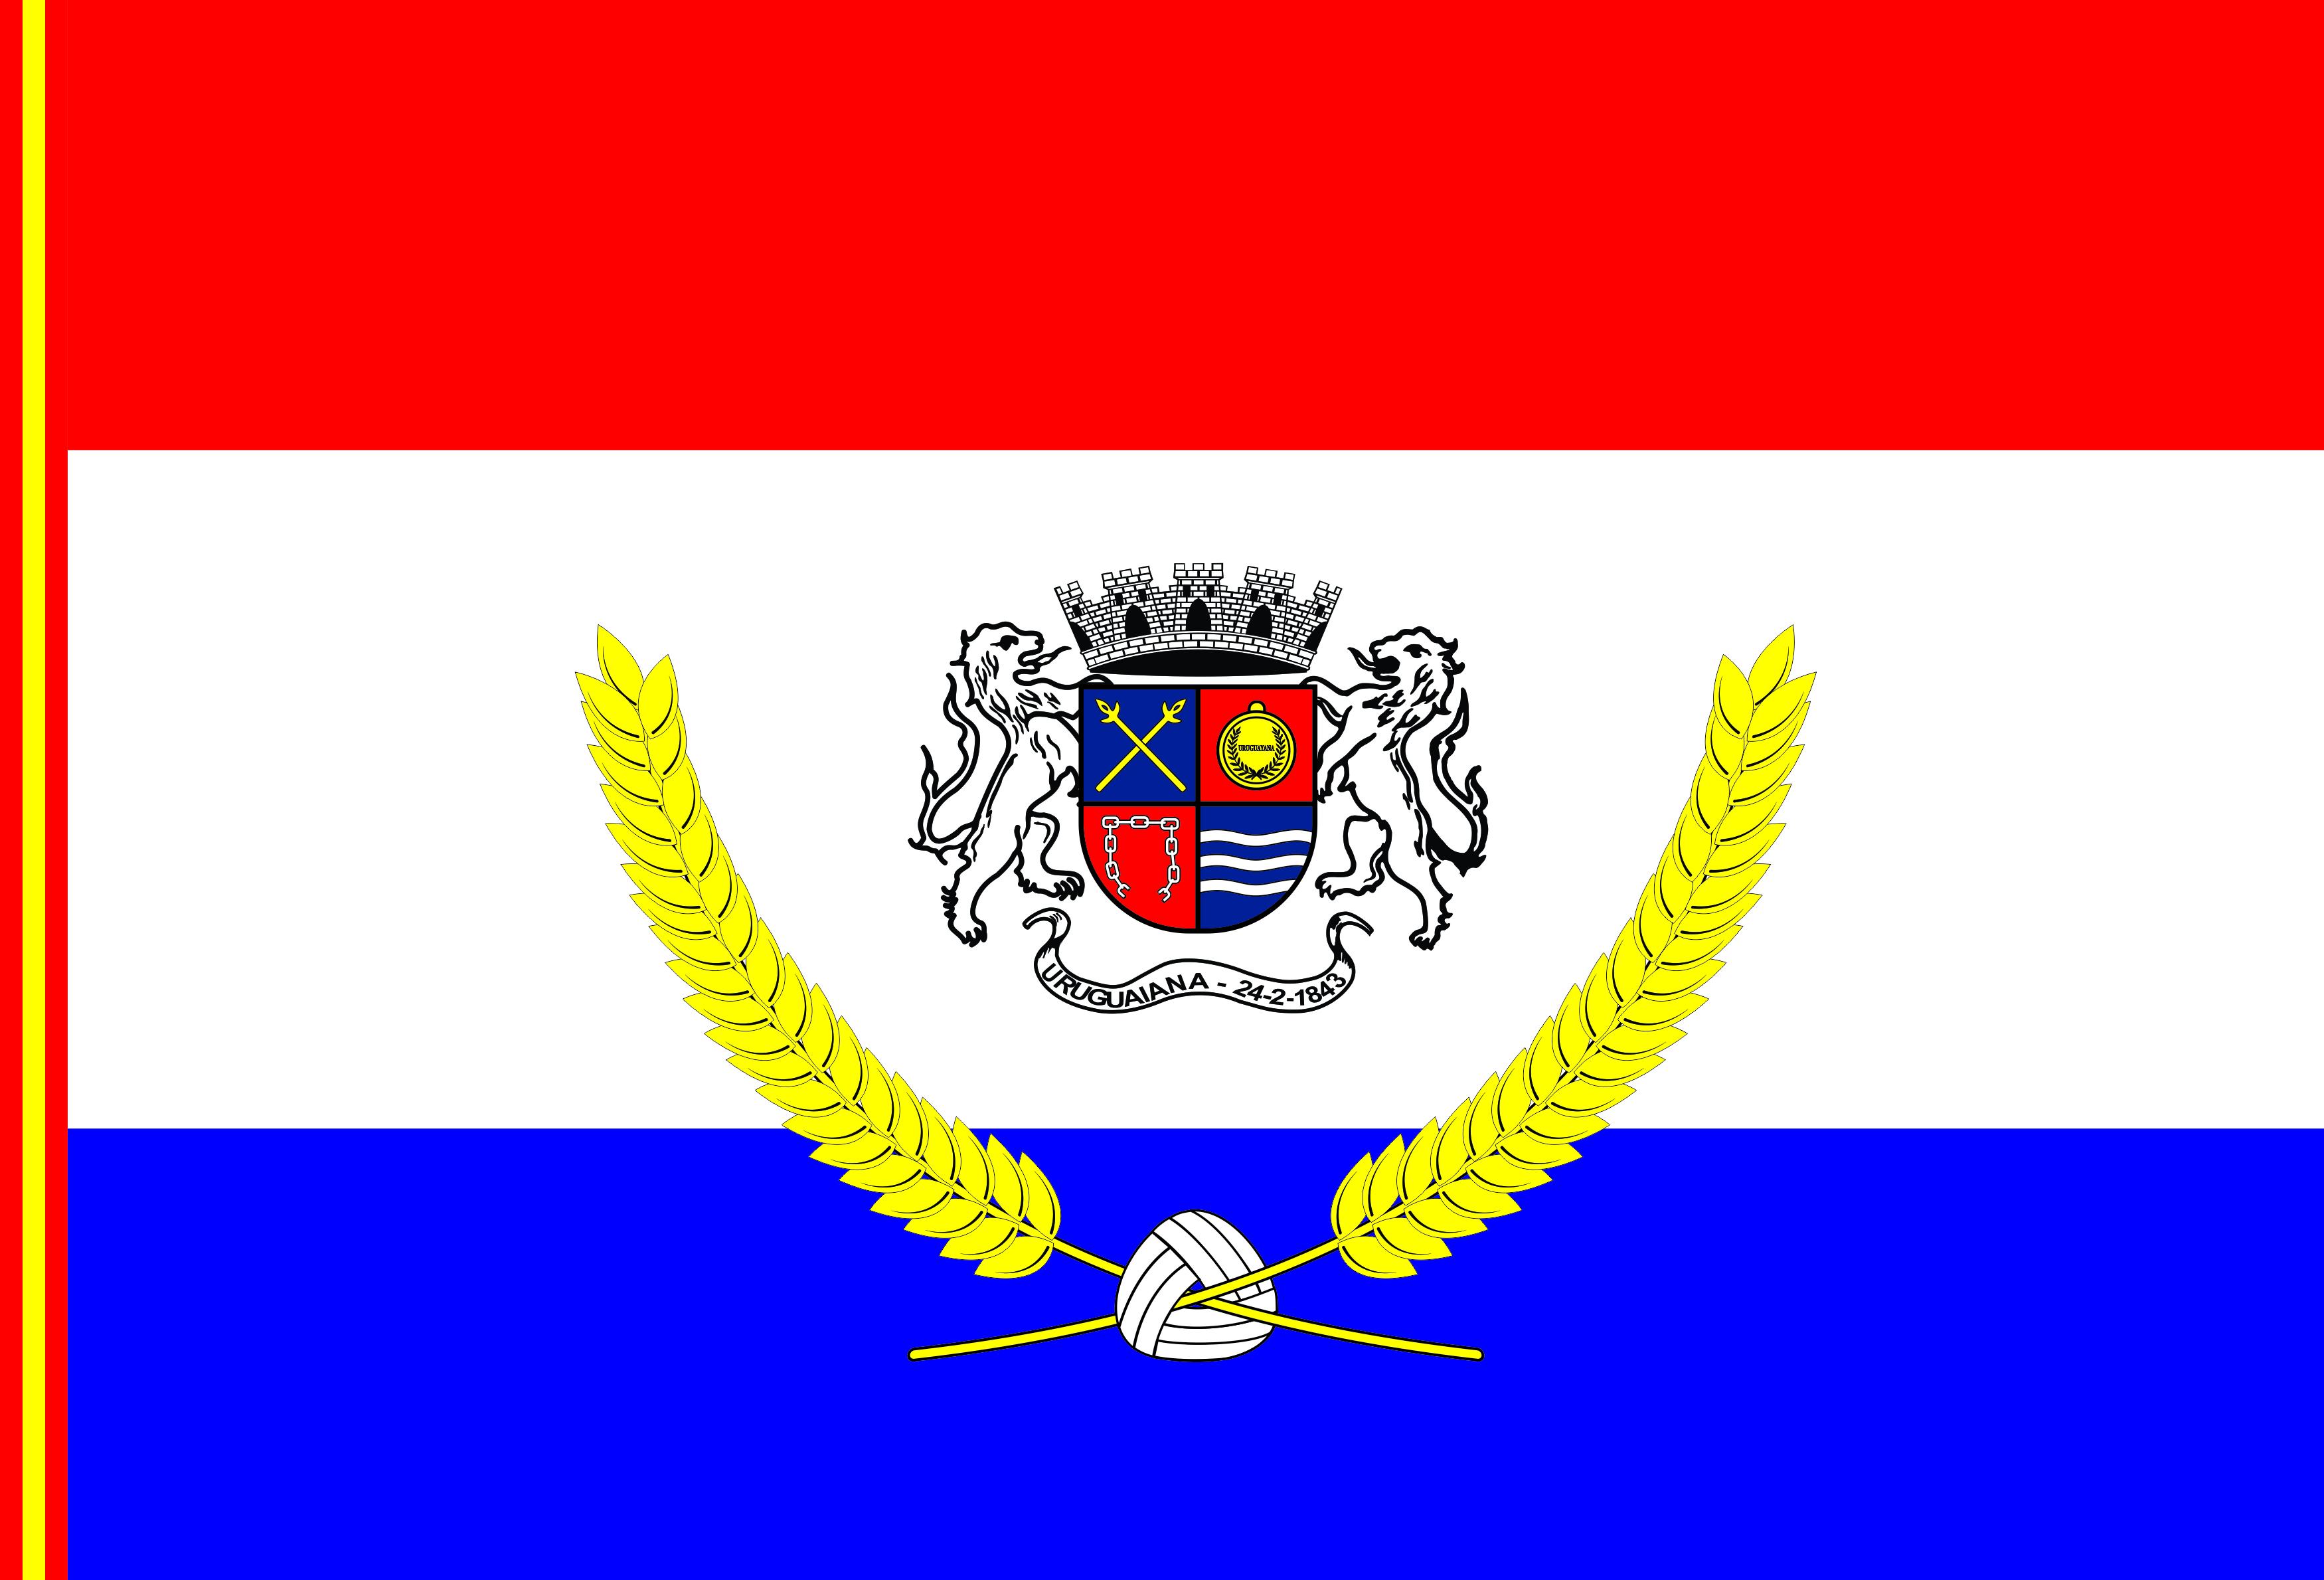 Bandeira de Uruguaiana